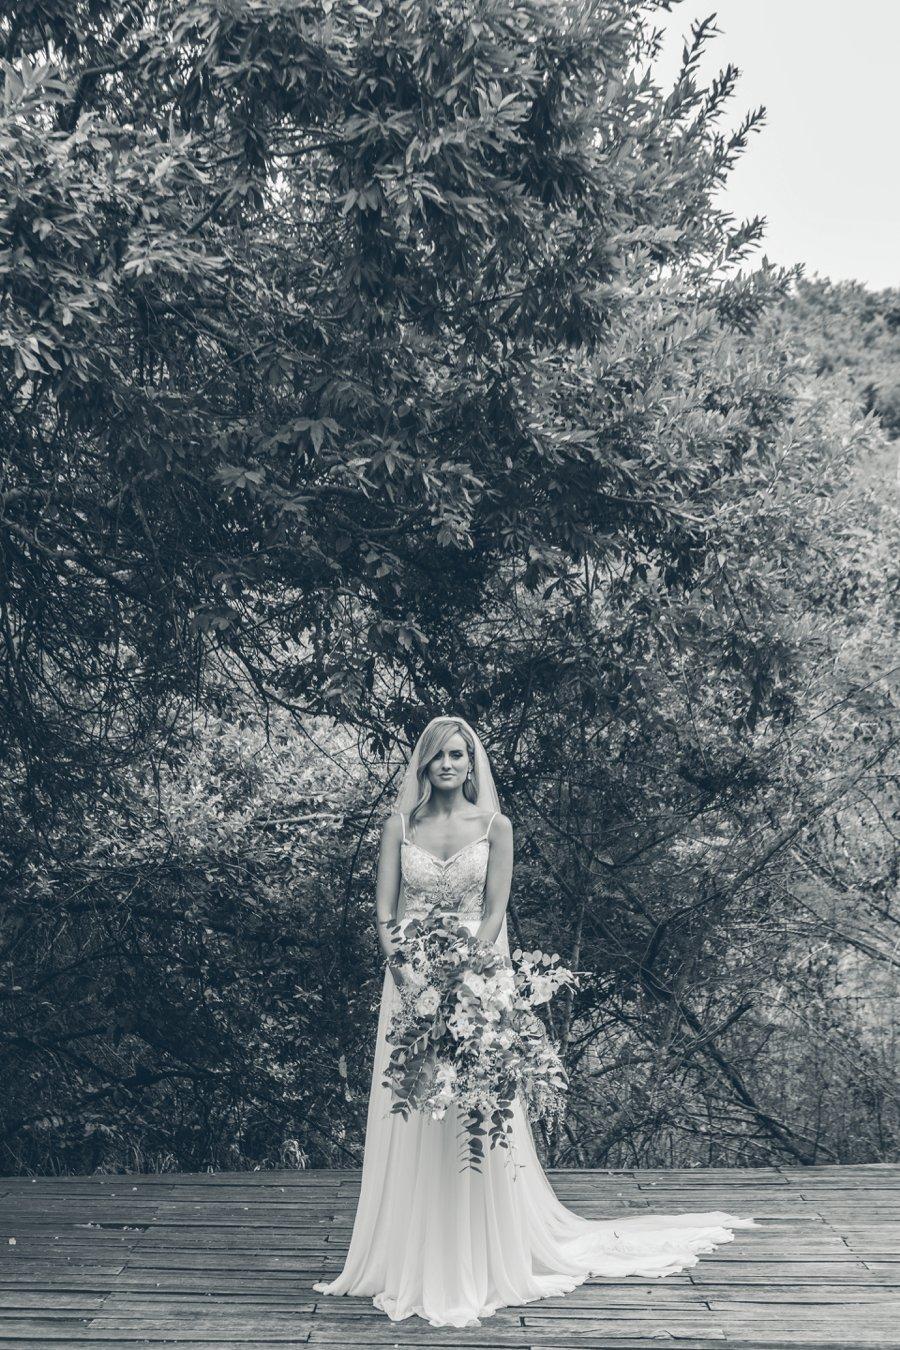 tala-game-reserve-durban-wedding-shanna-jones-photography-kendall-dan-1265_HoorayWeddings